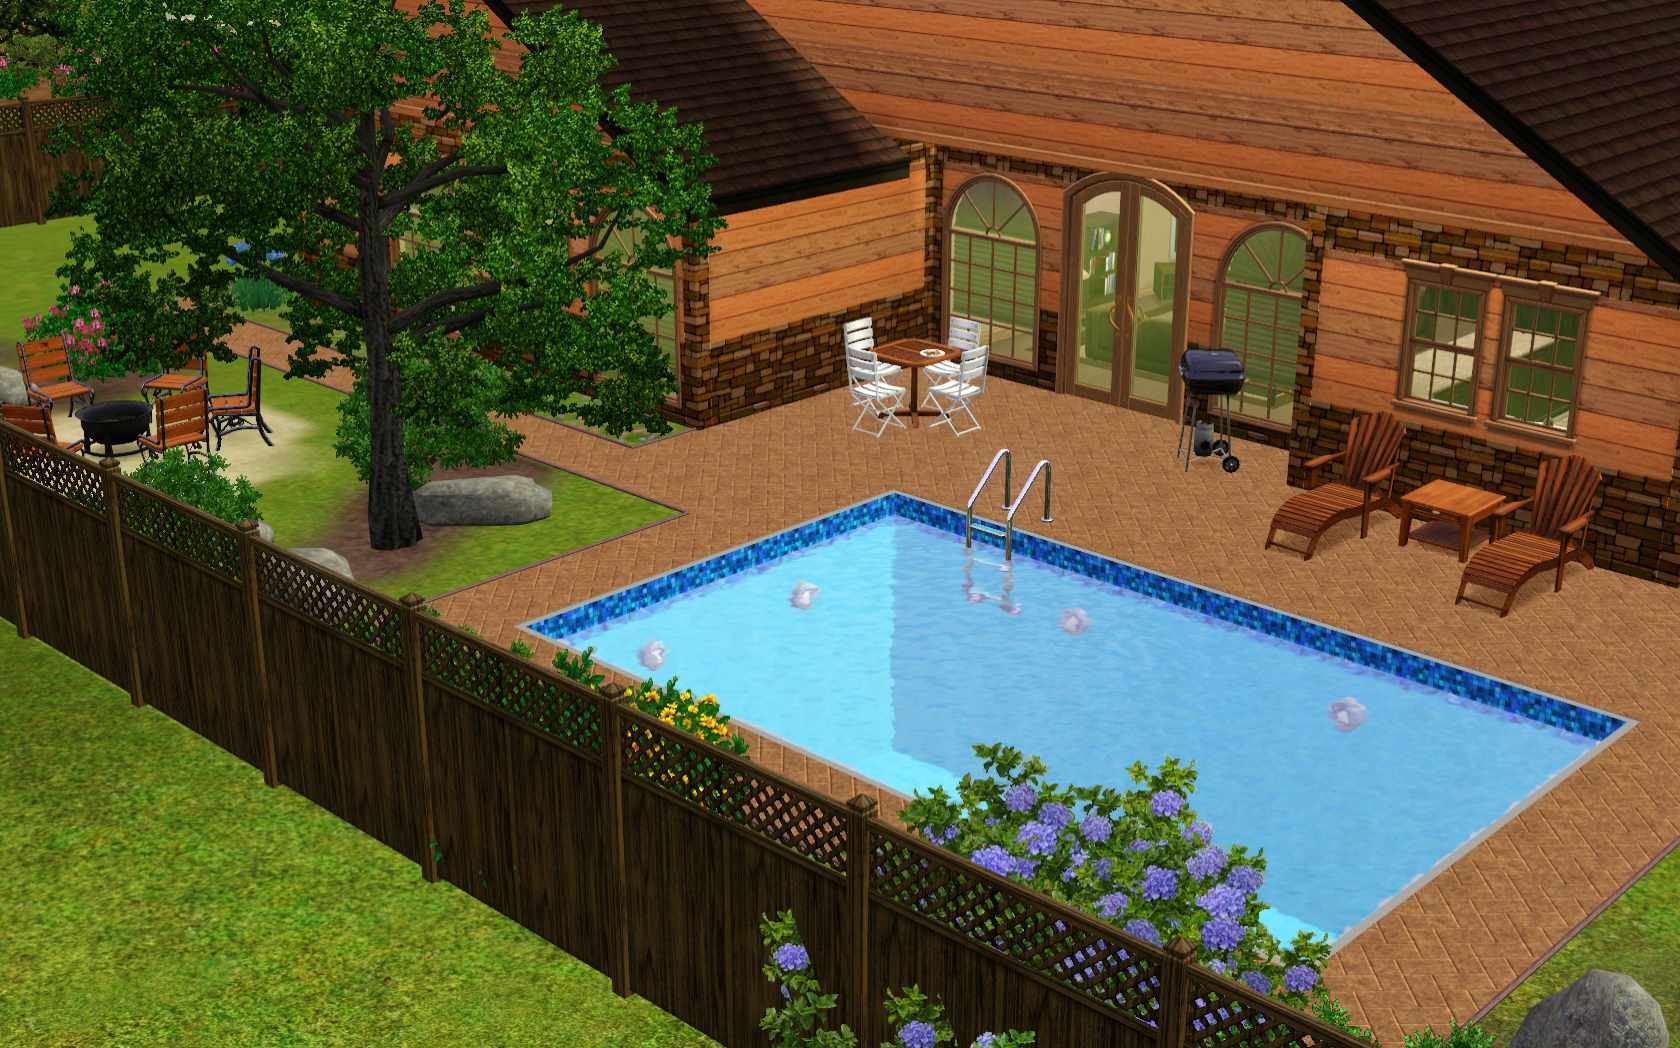 Backyard Jacuzzi Ideas Outdoor Furniture Design - House Plans